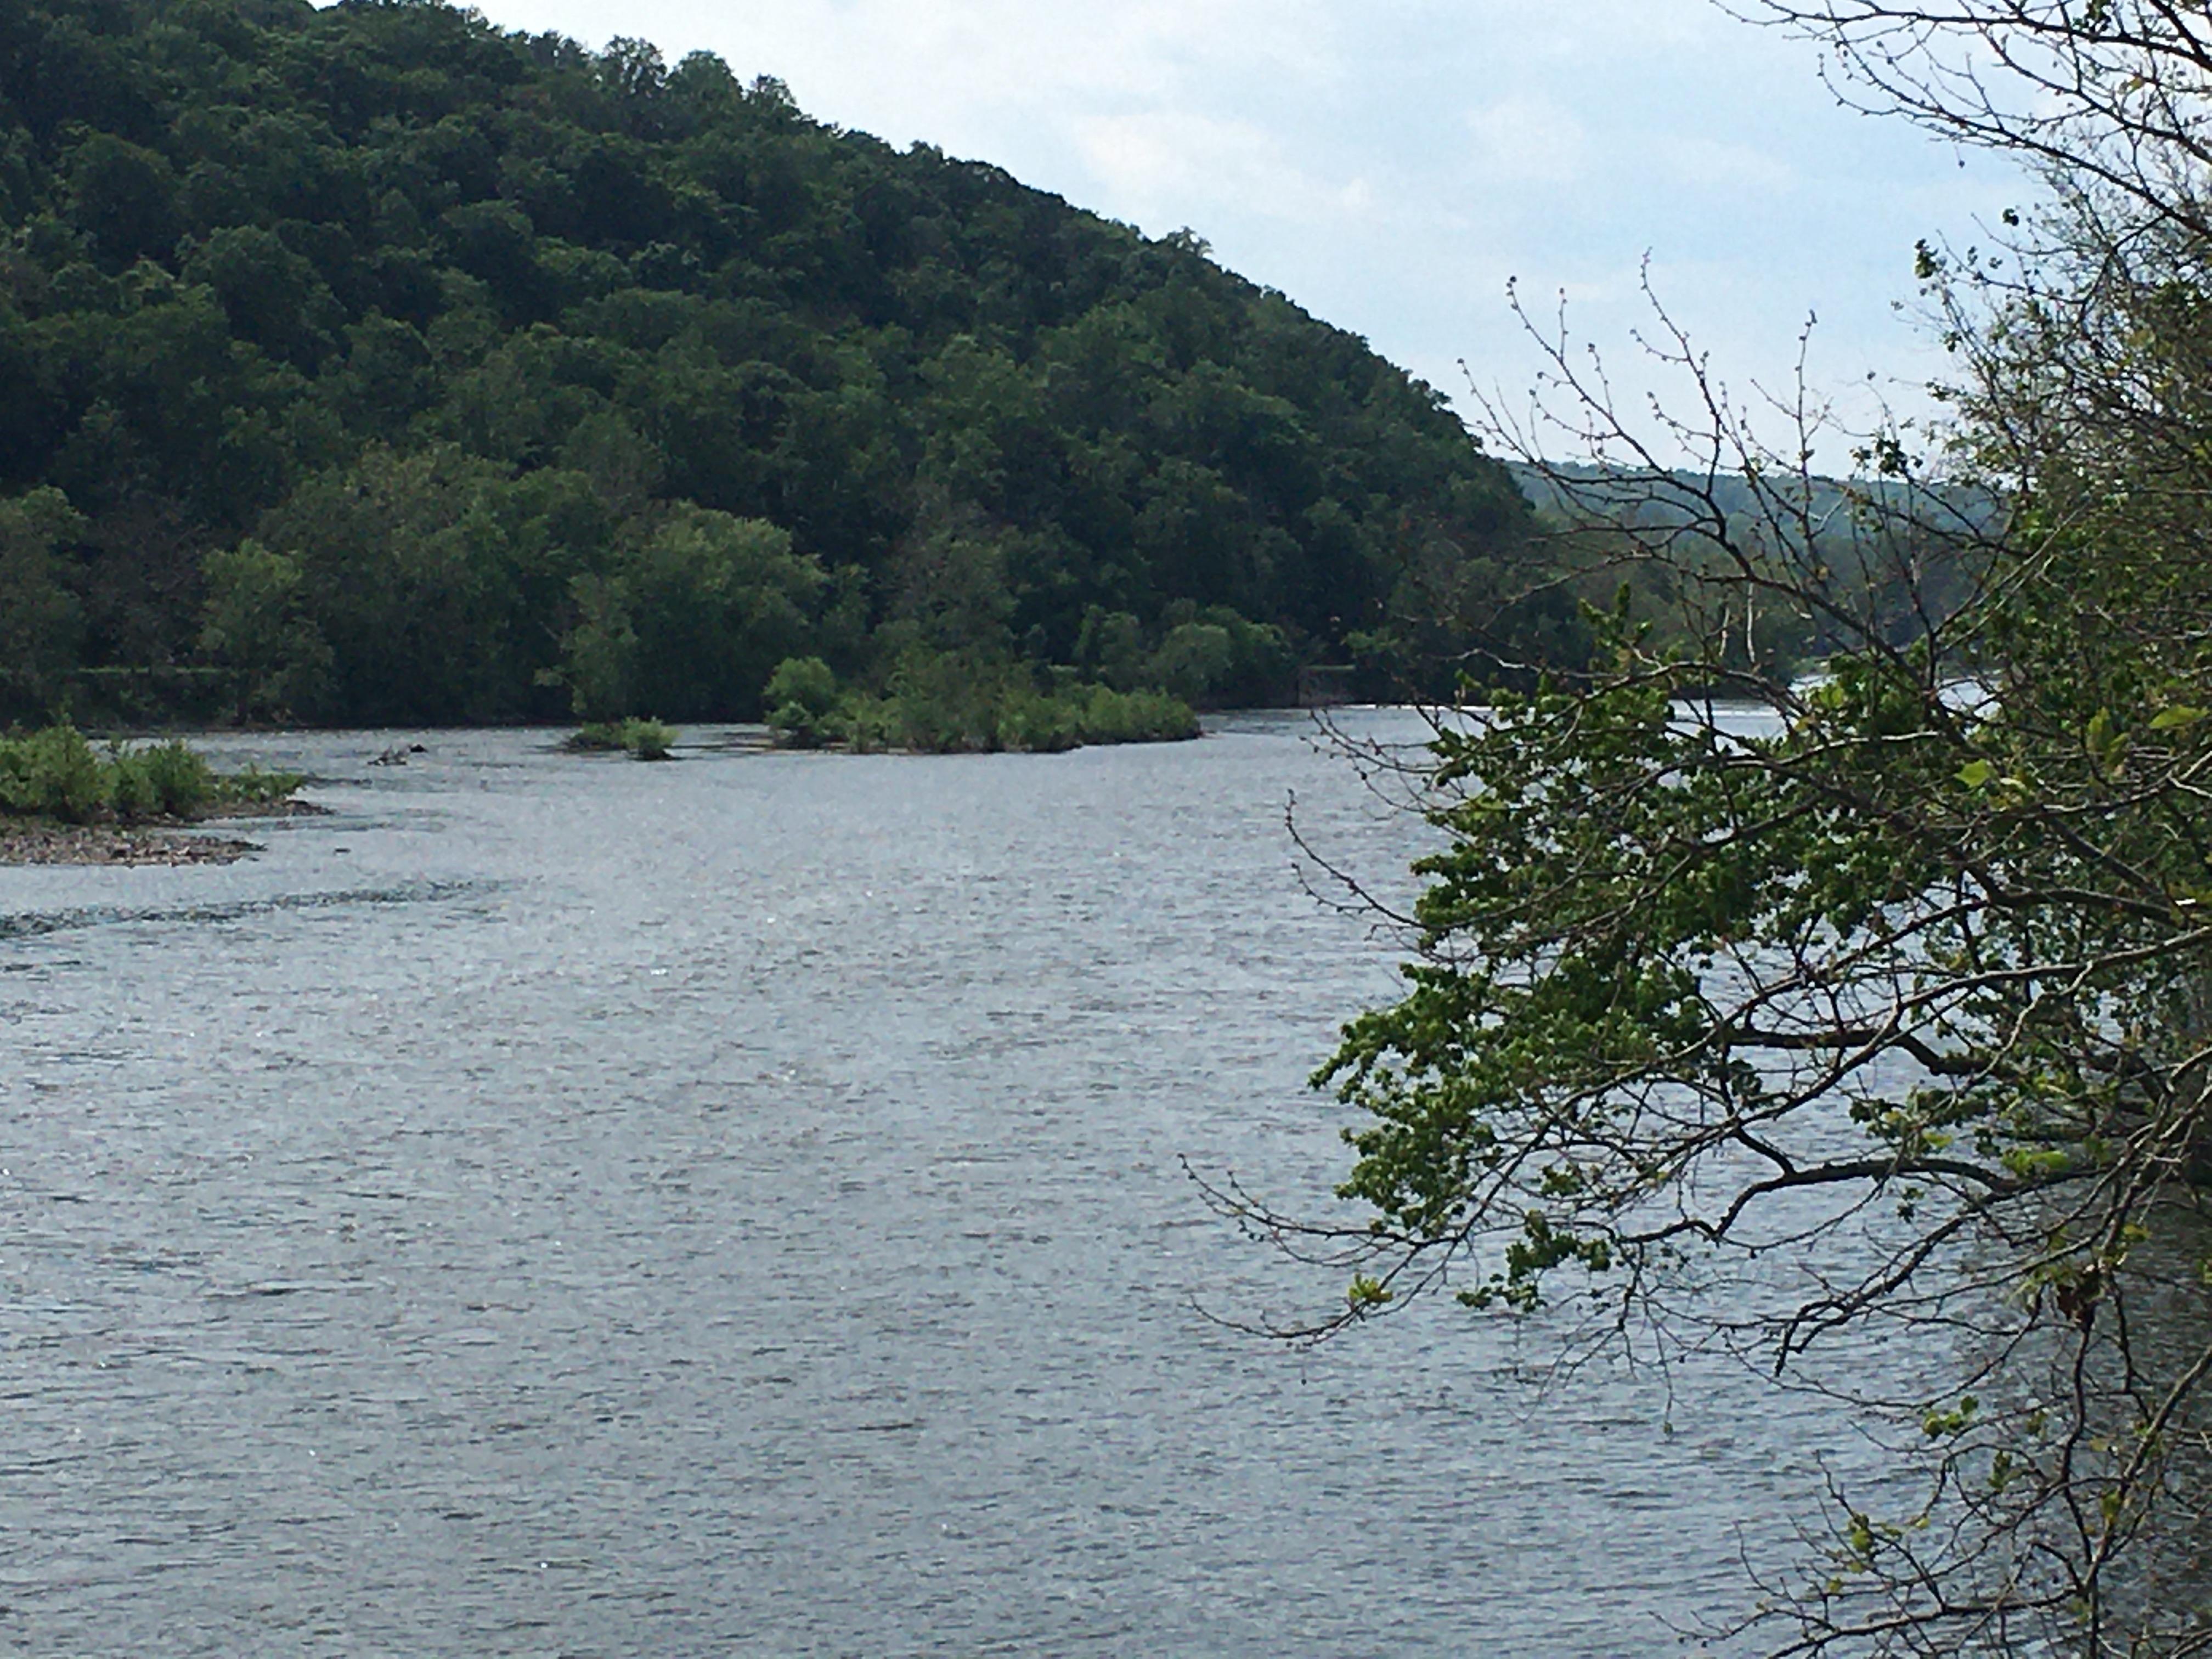 Delaware River, looking north